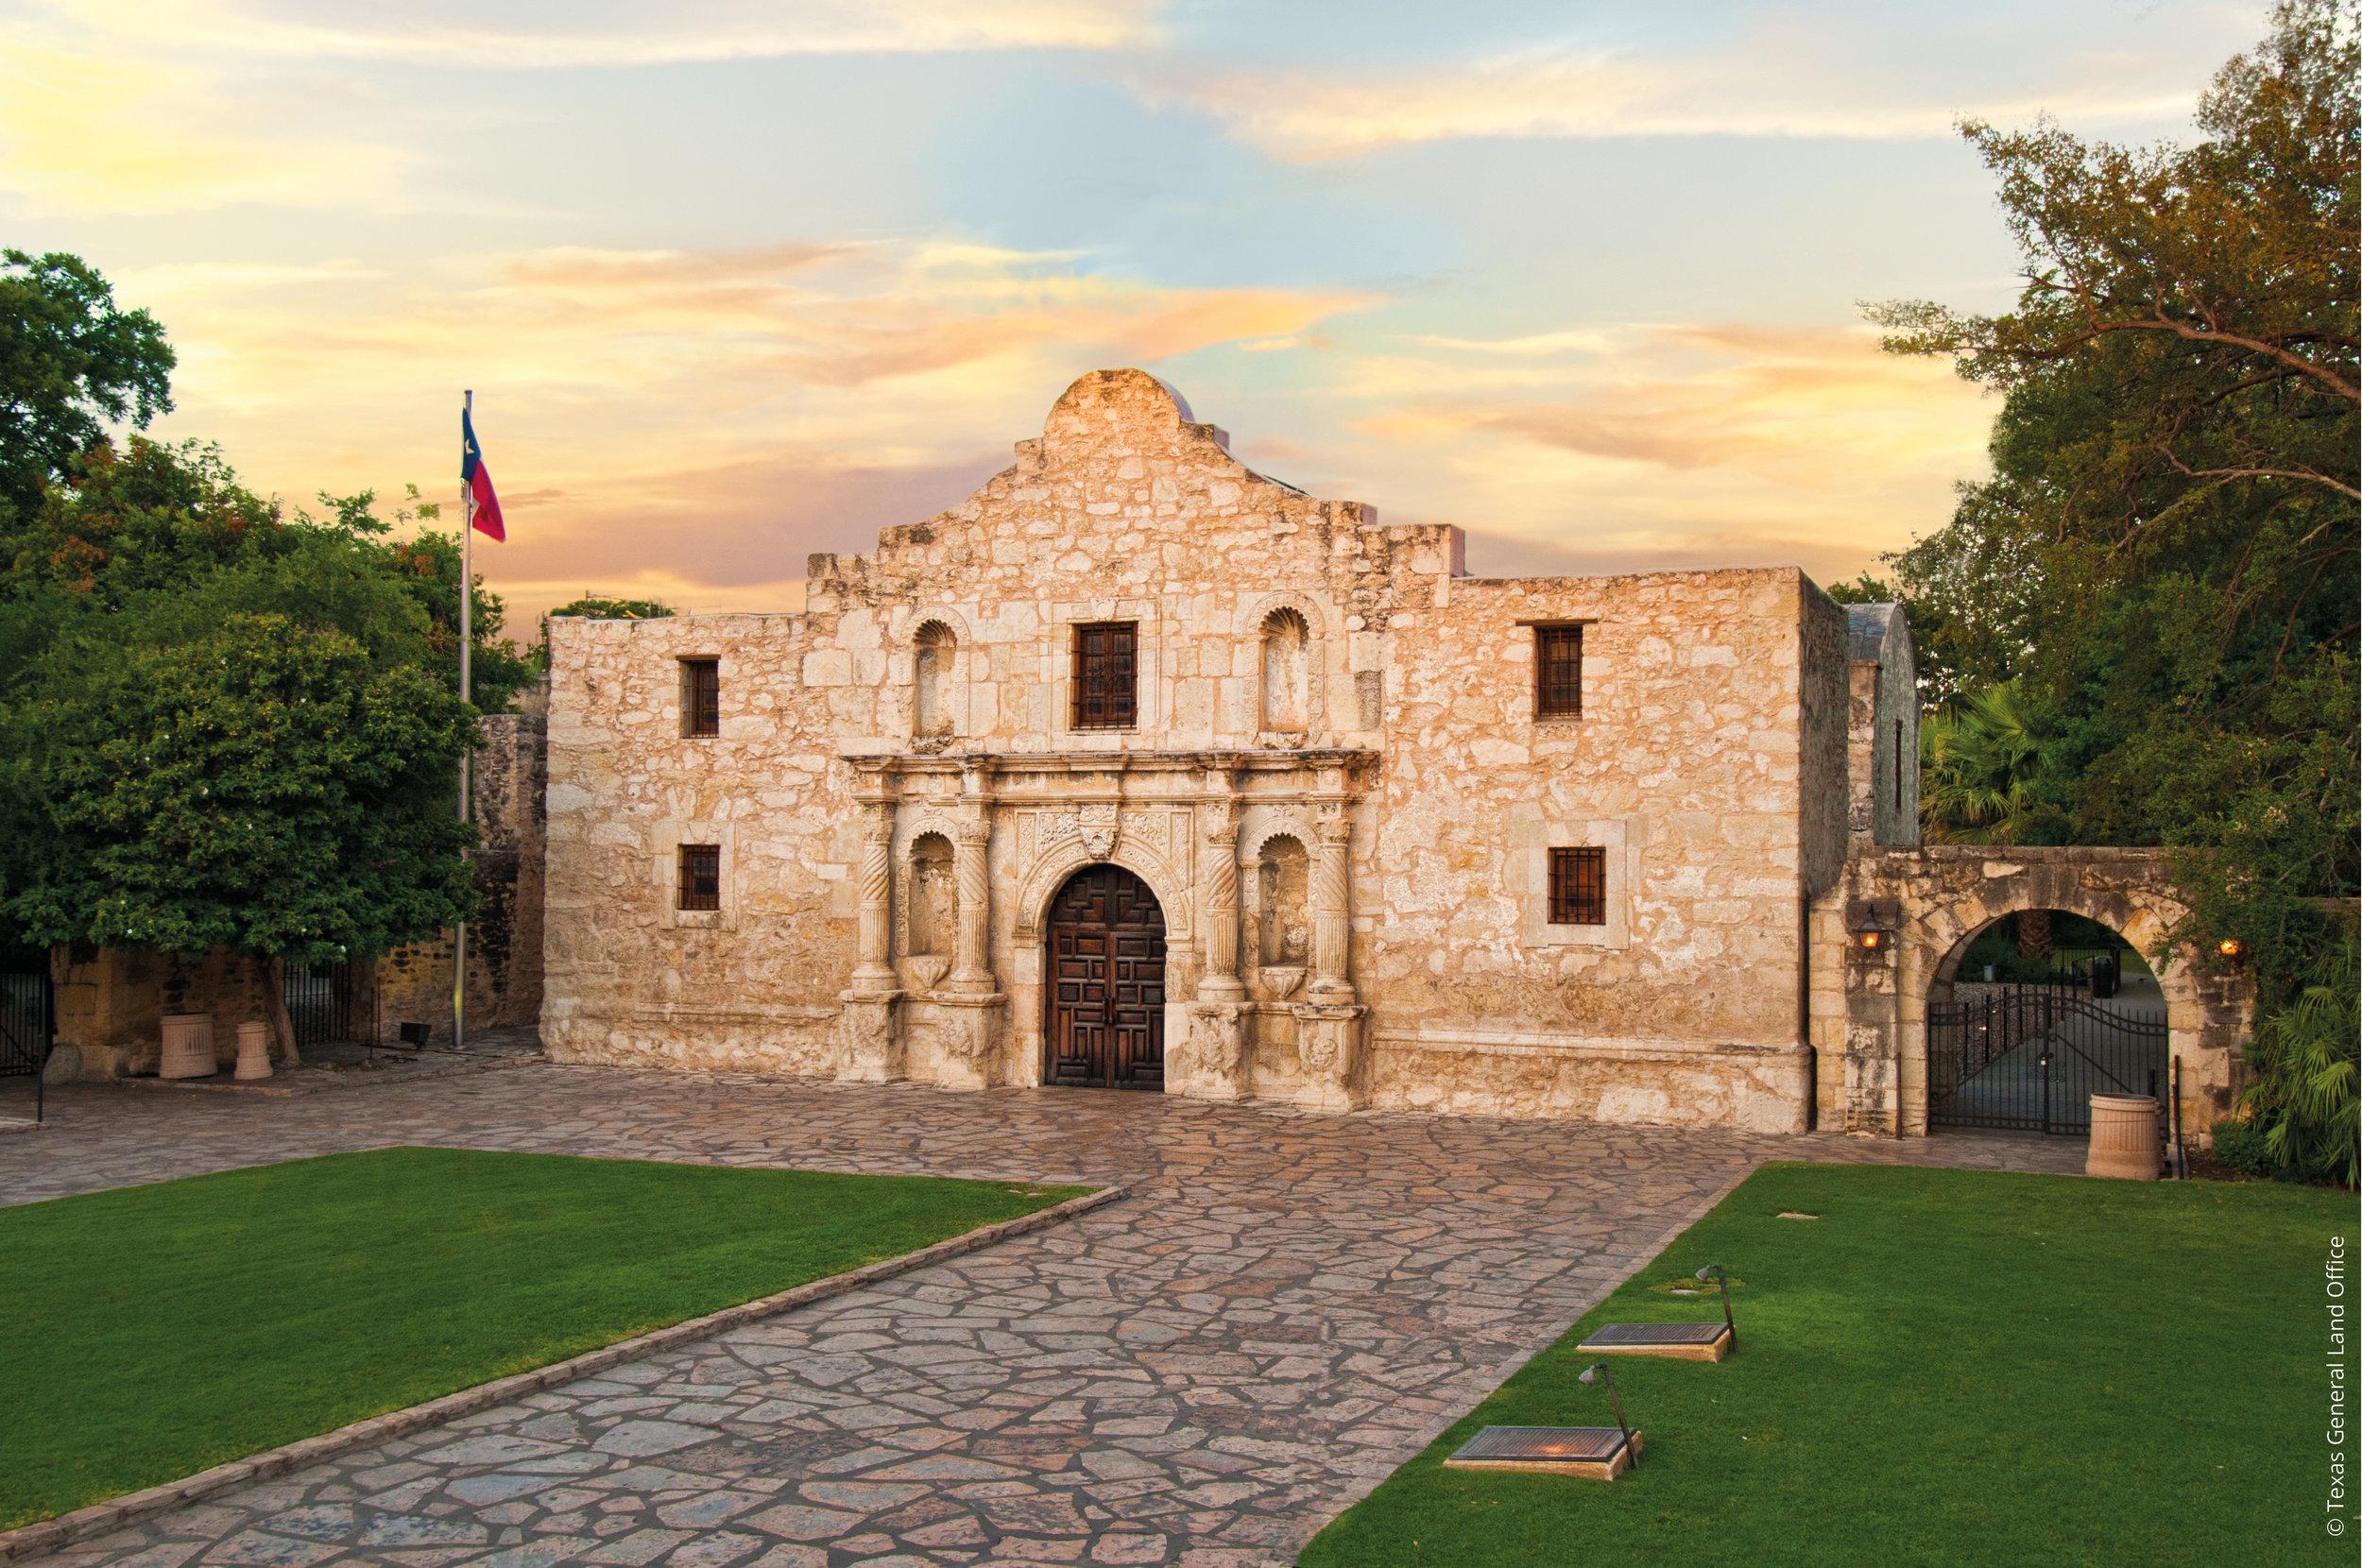 The Alamo, Texas © Texas General Land Office